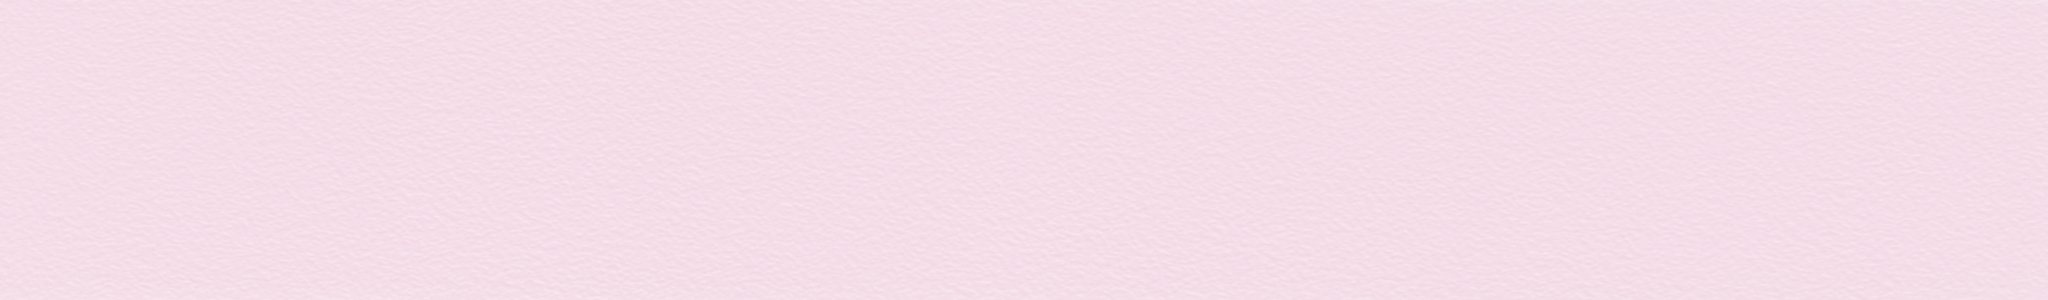 HU 13336 кромка ABS розовая жемчуг XG